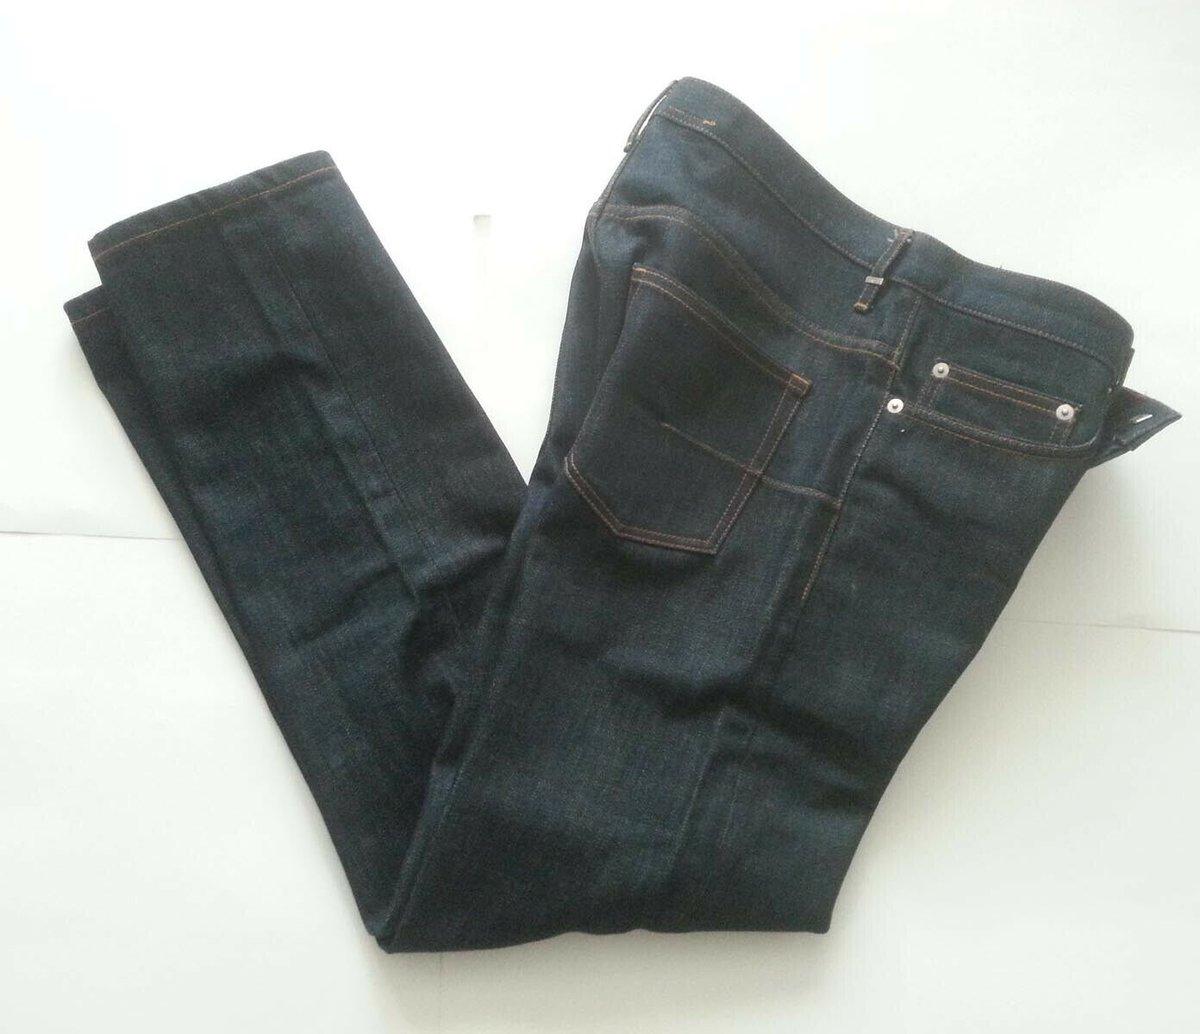 Sale Good Price! https://t.co/Waa0zOtvfK DIOR Men Jeans Size 32 x 30...